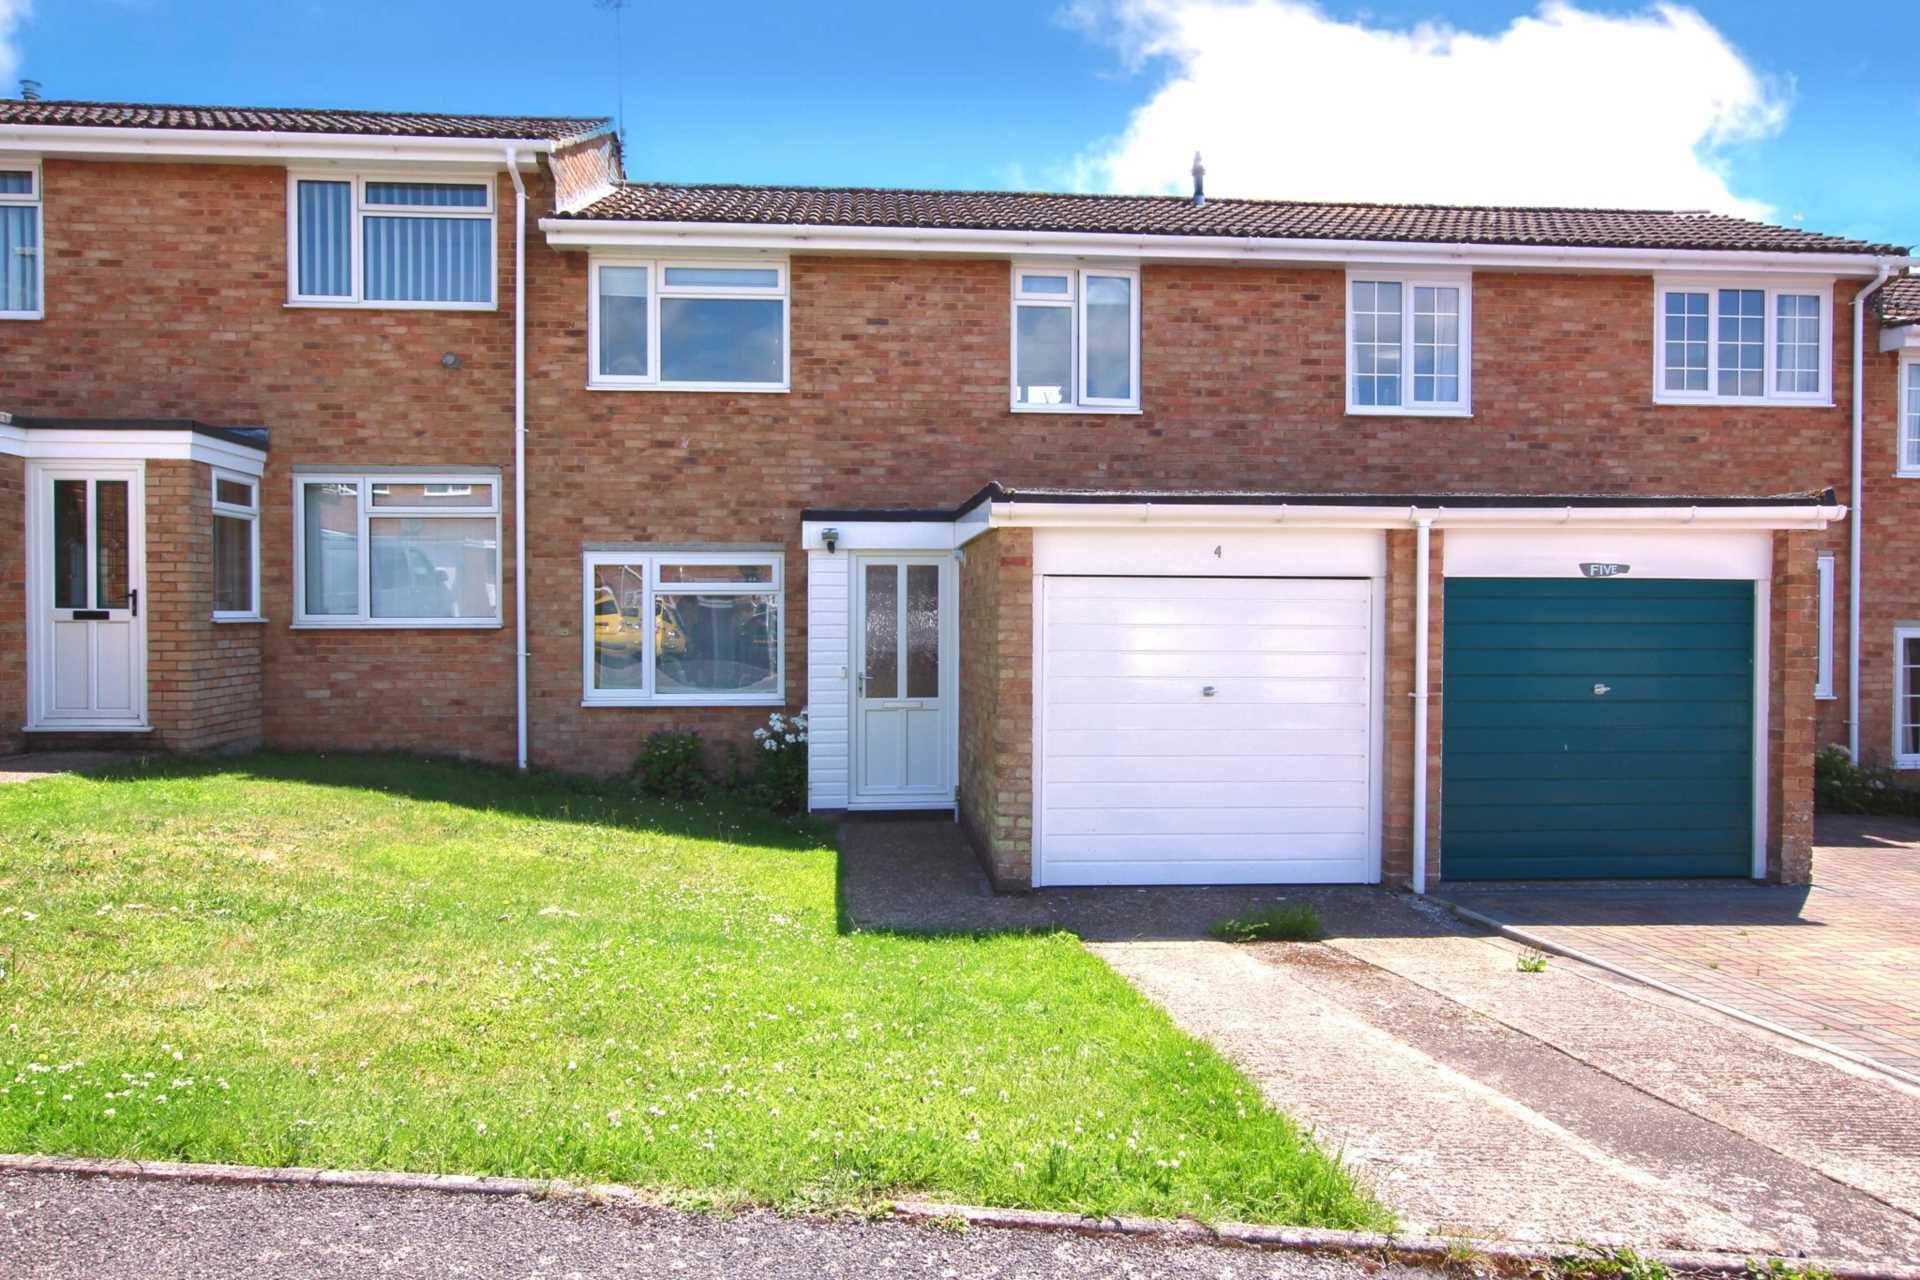 2 bed terraced house for sale in Lockeridge Close, Blandford Forum, Blandford Forum 0